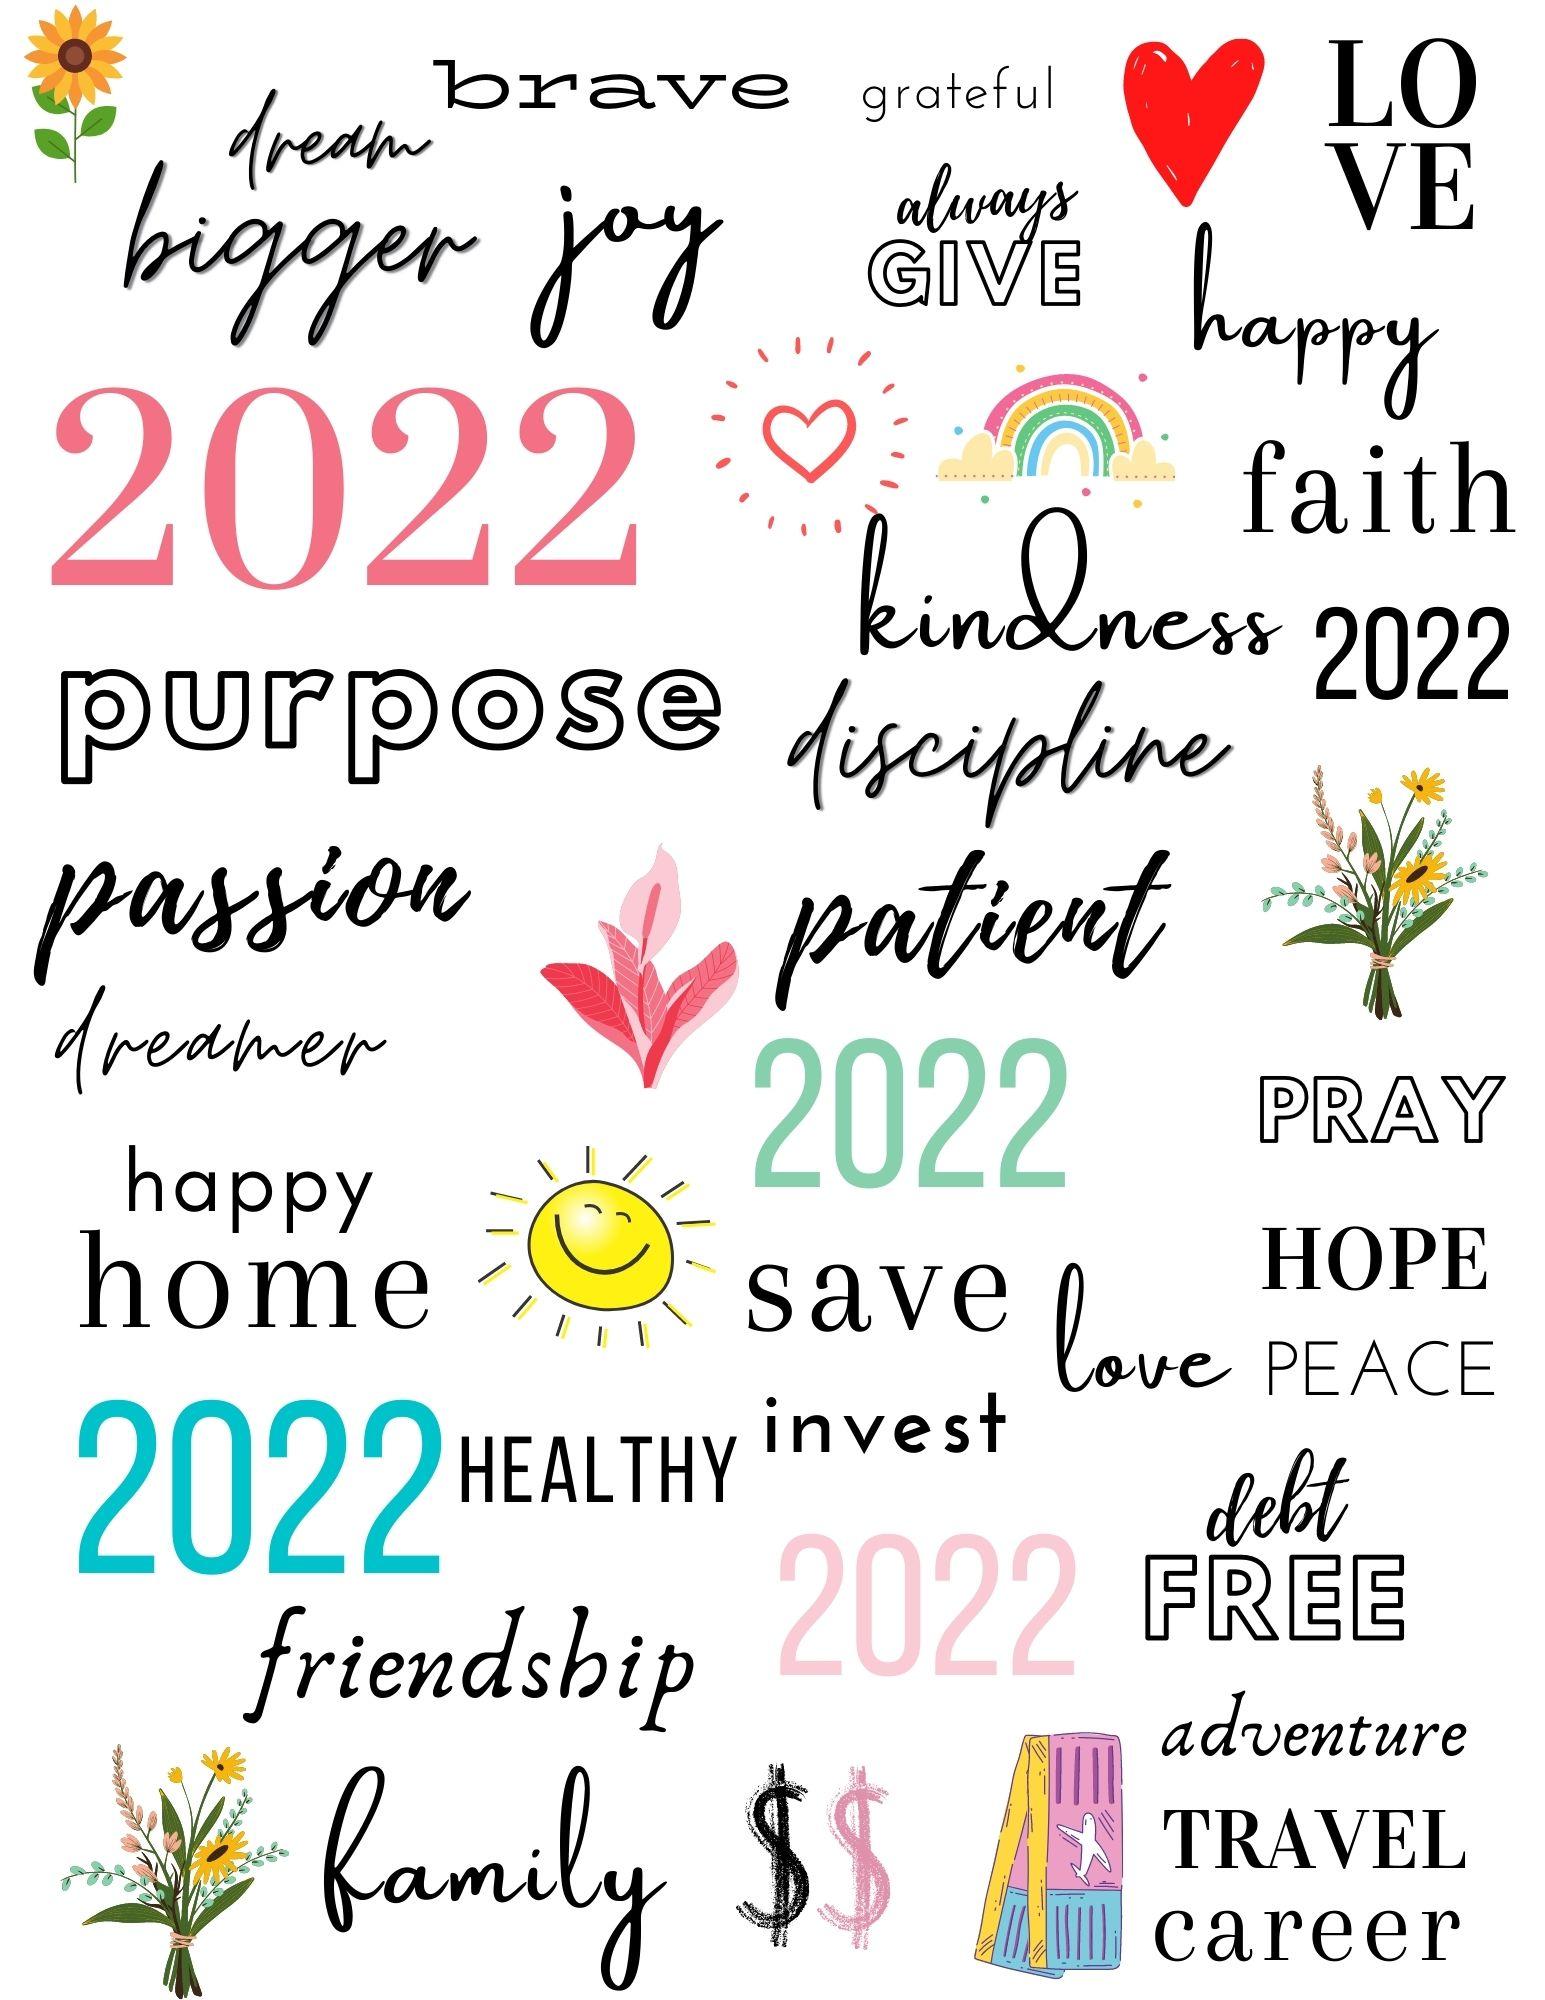 44 Beautiful & Inspiring Vision Board Printables